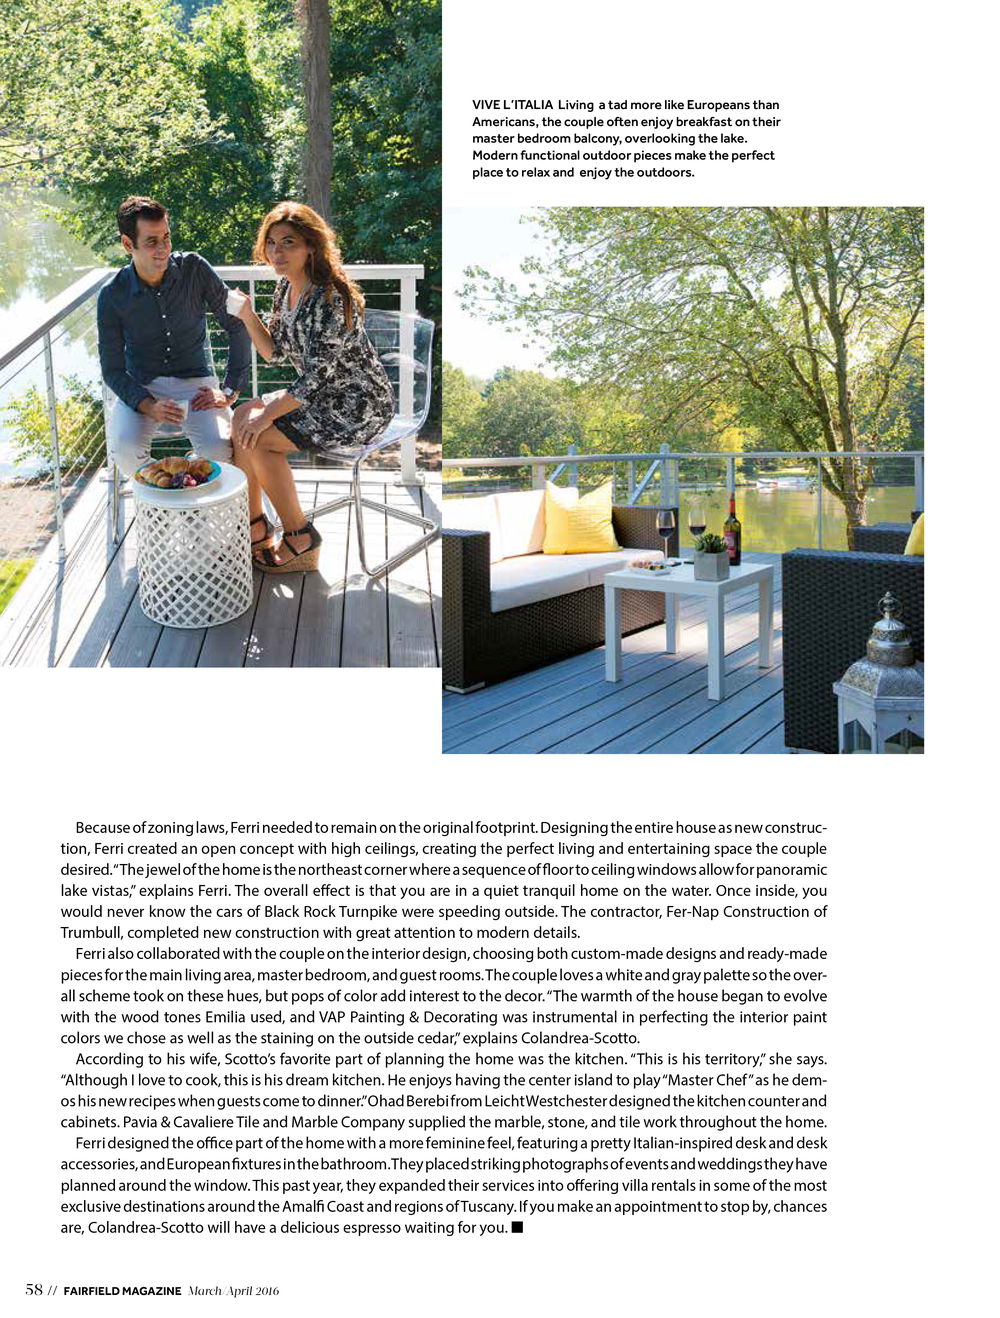 Fairfield Magazine_La Dolce Vita-5.jpg